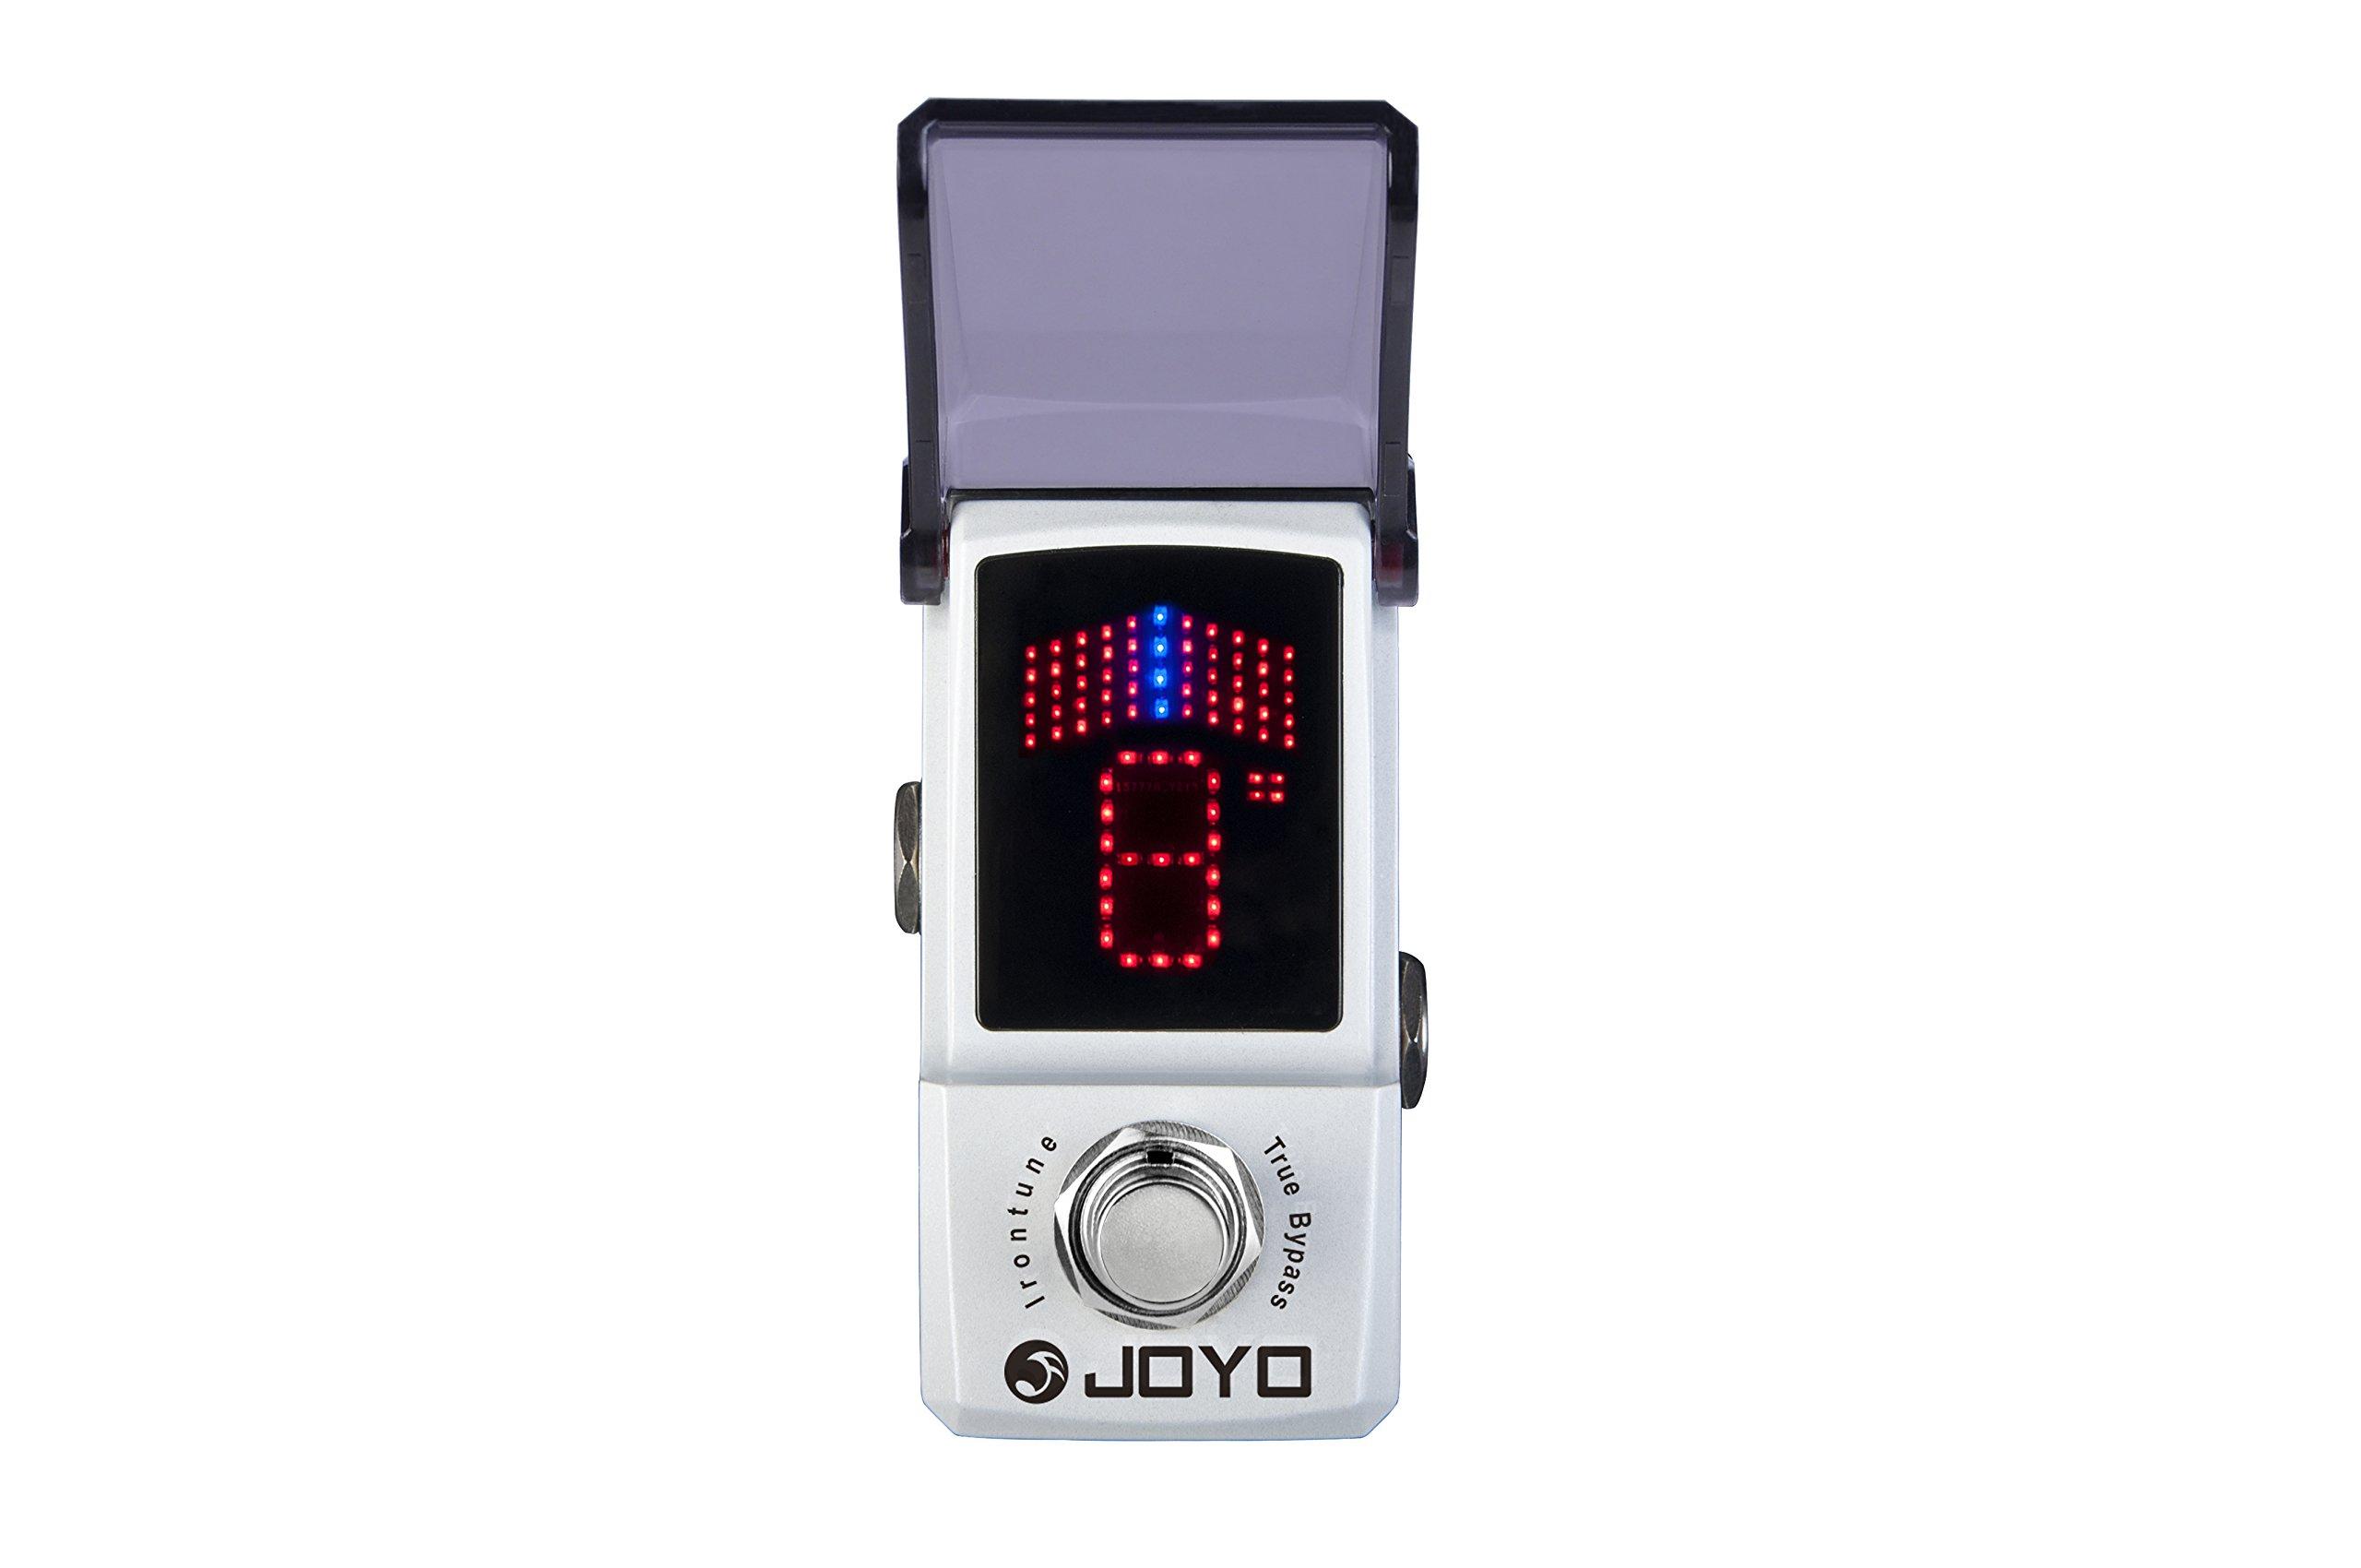 Joyo JF-326 Irontune Pedal Tuner Electric Guitar Single Effect by JOYO